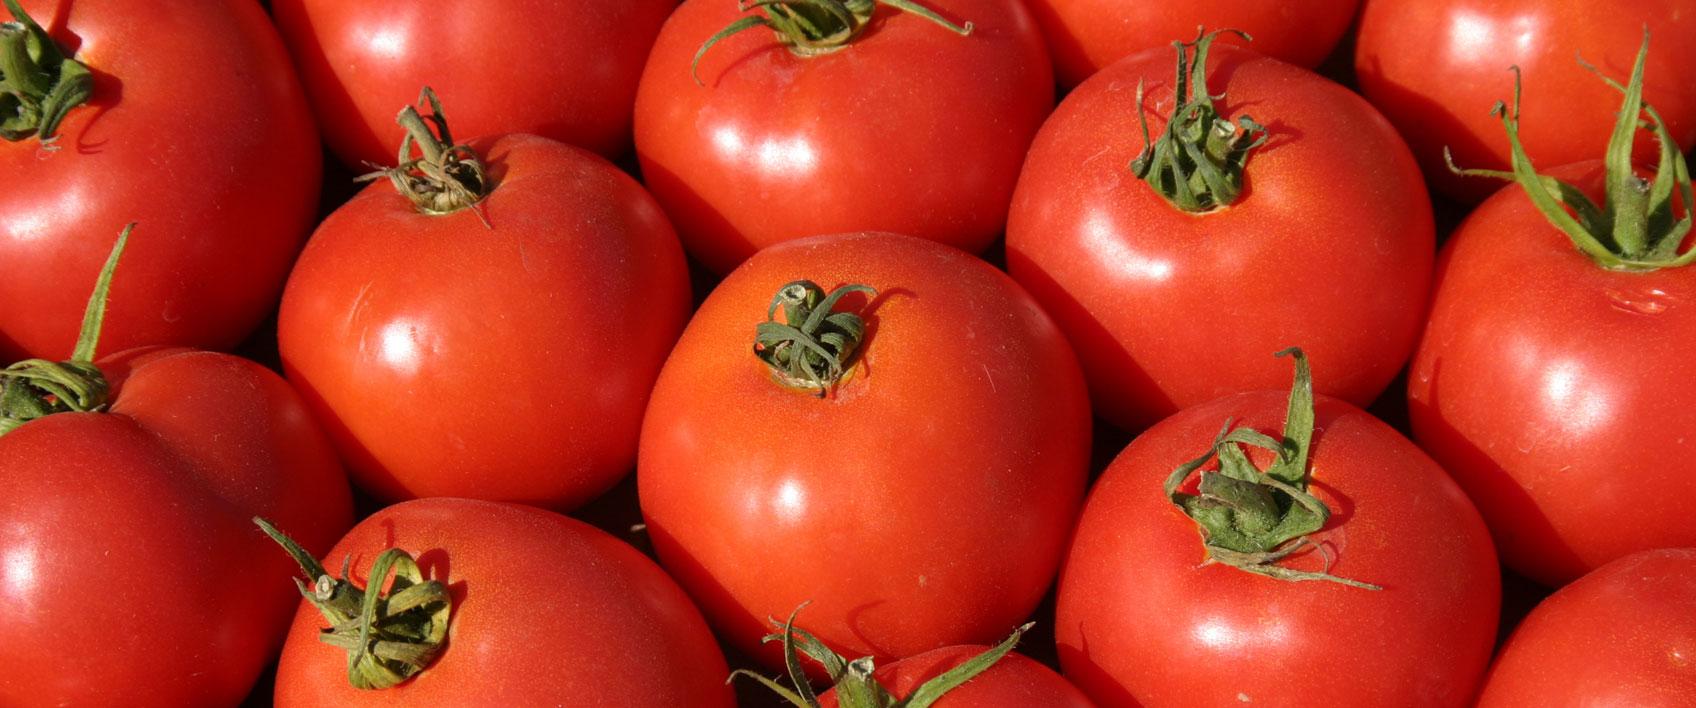 Watermelons, Grapes, & Vegetables (Mexico) — Giumarra Companies